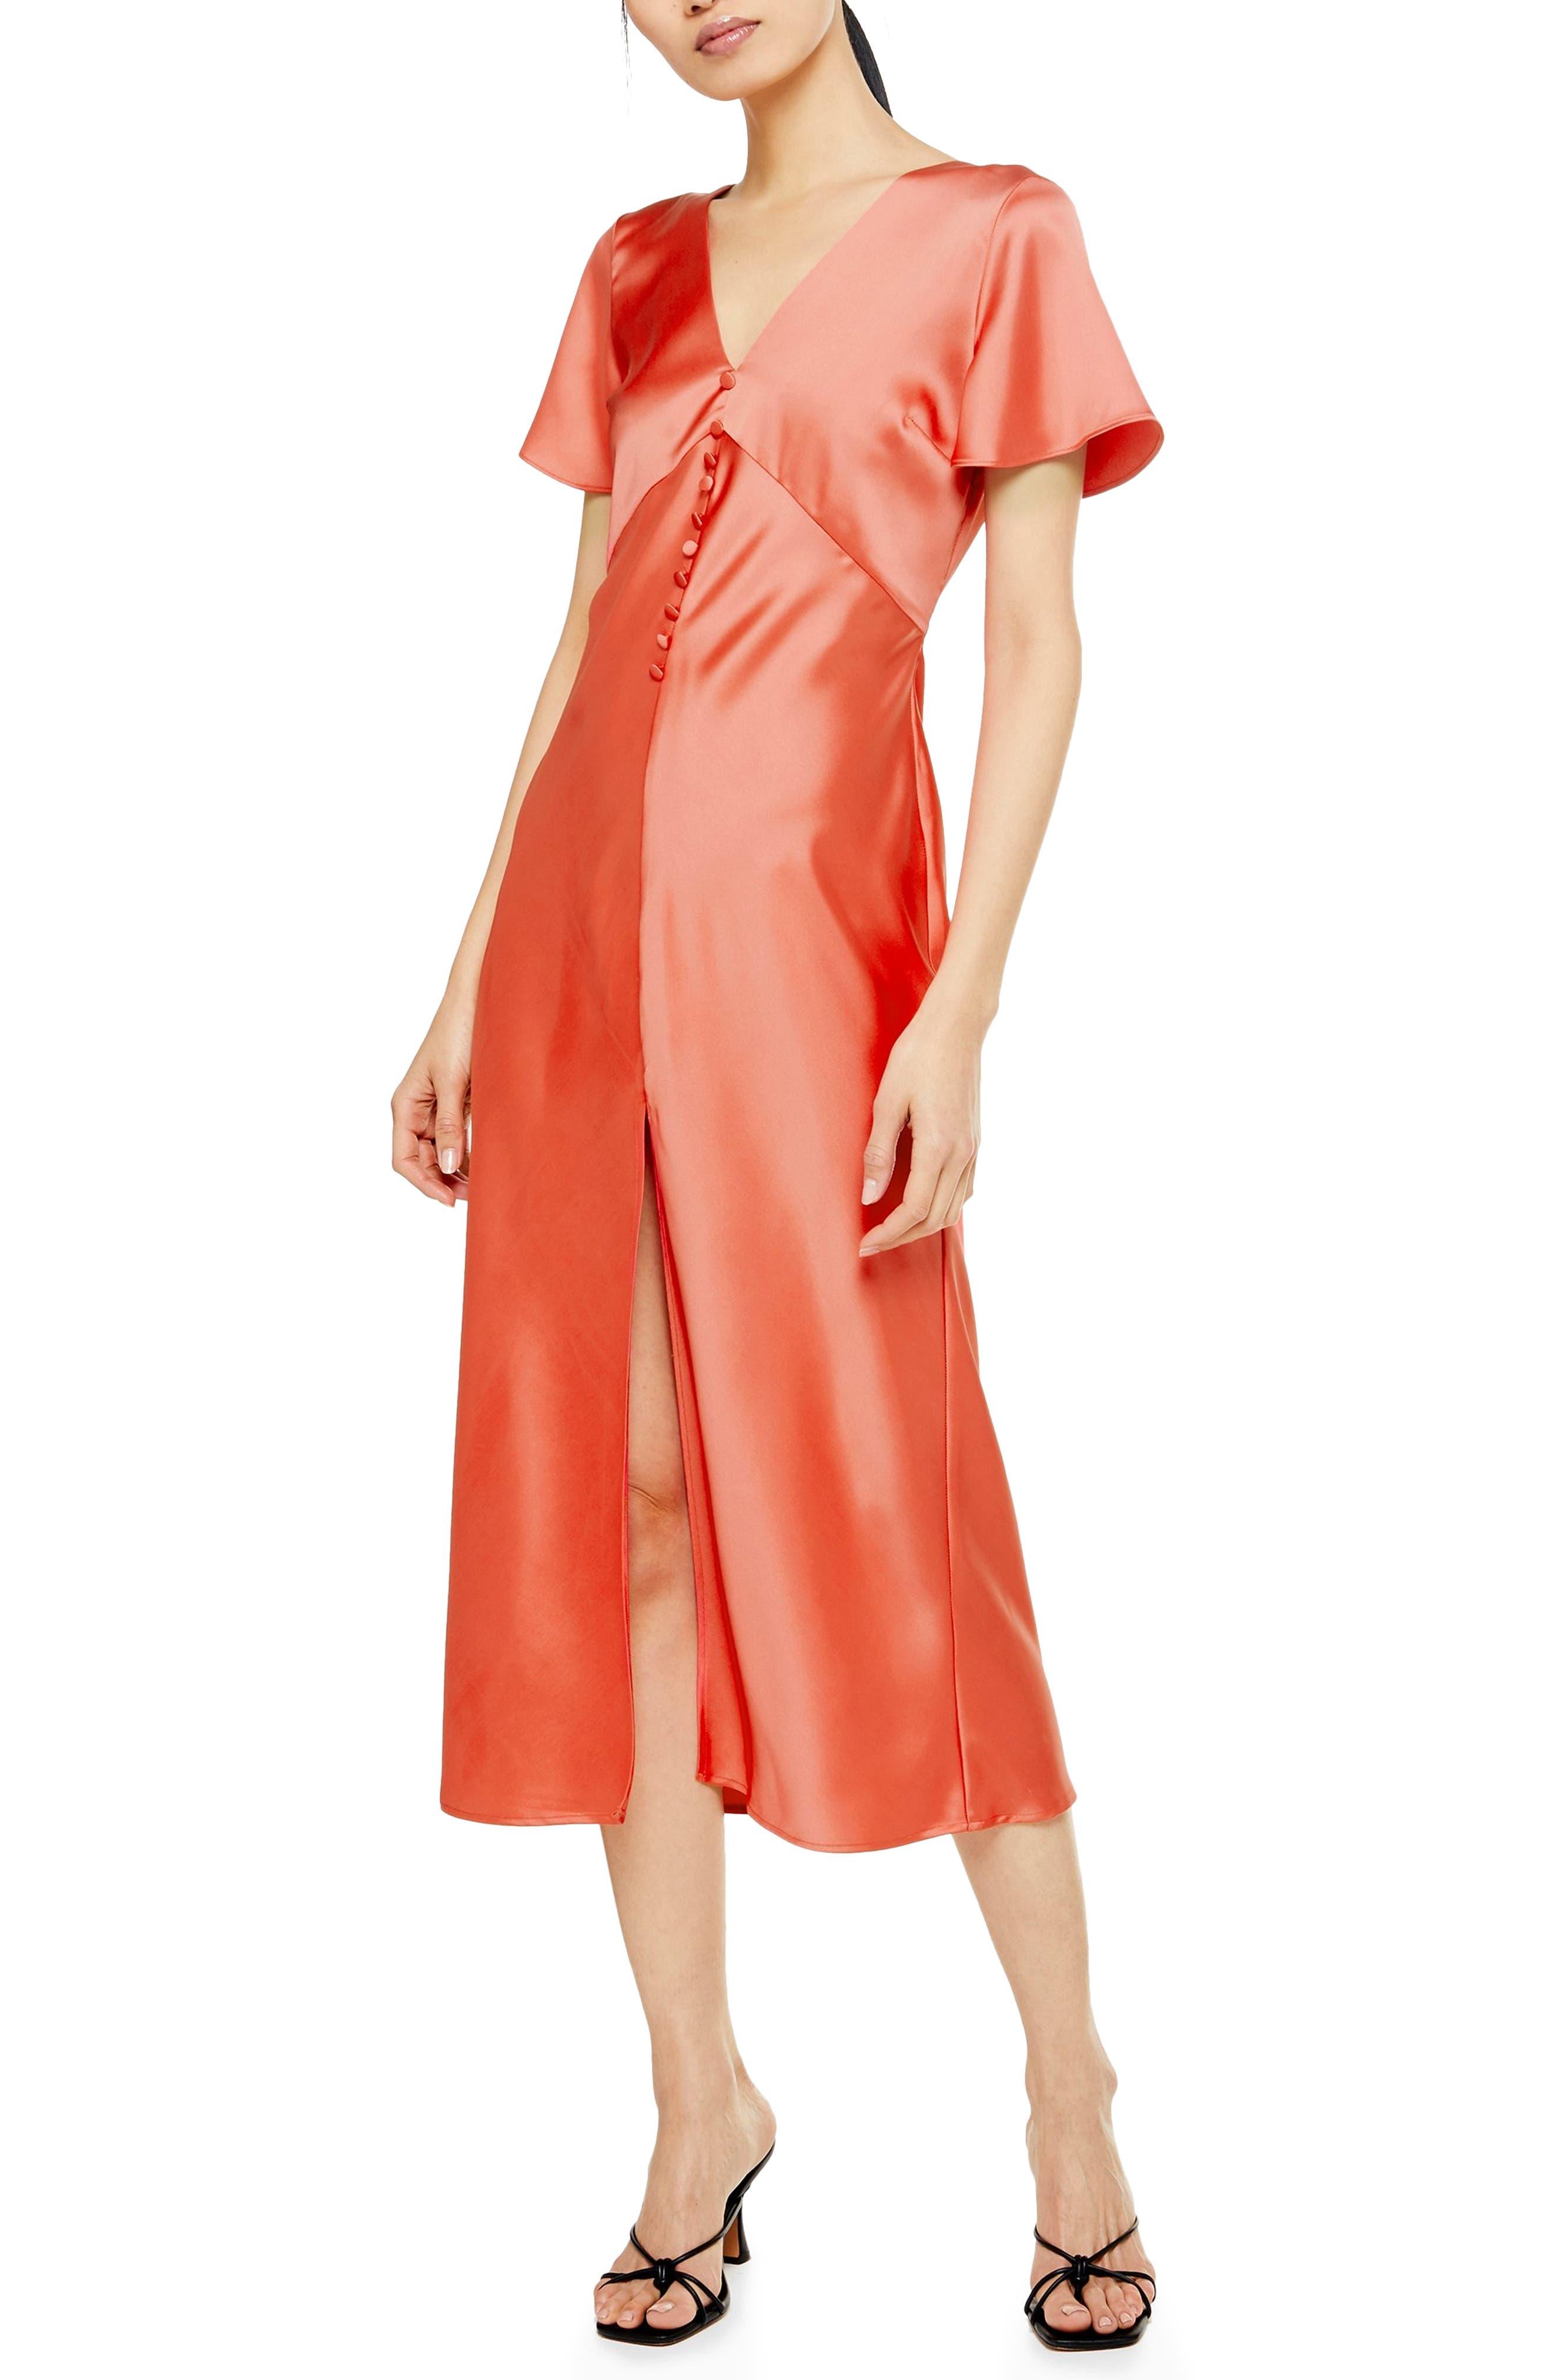 Topshop Angel Sleeve Bias Cut Satin Midi Dress, US (fits like 2-4) - Coral